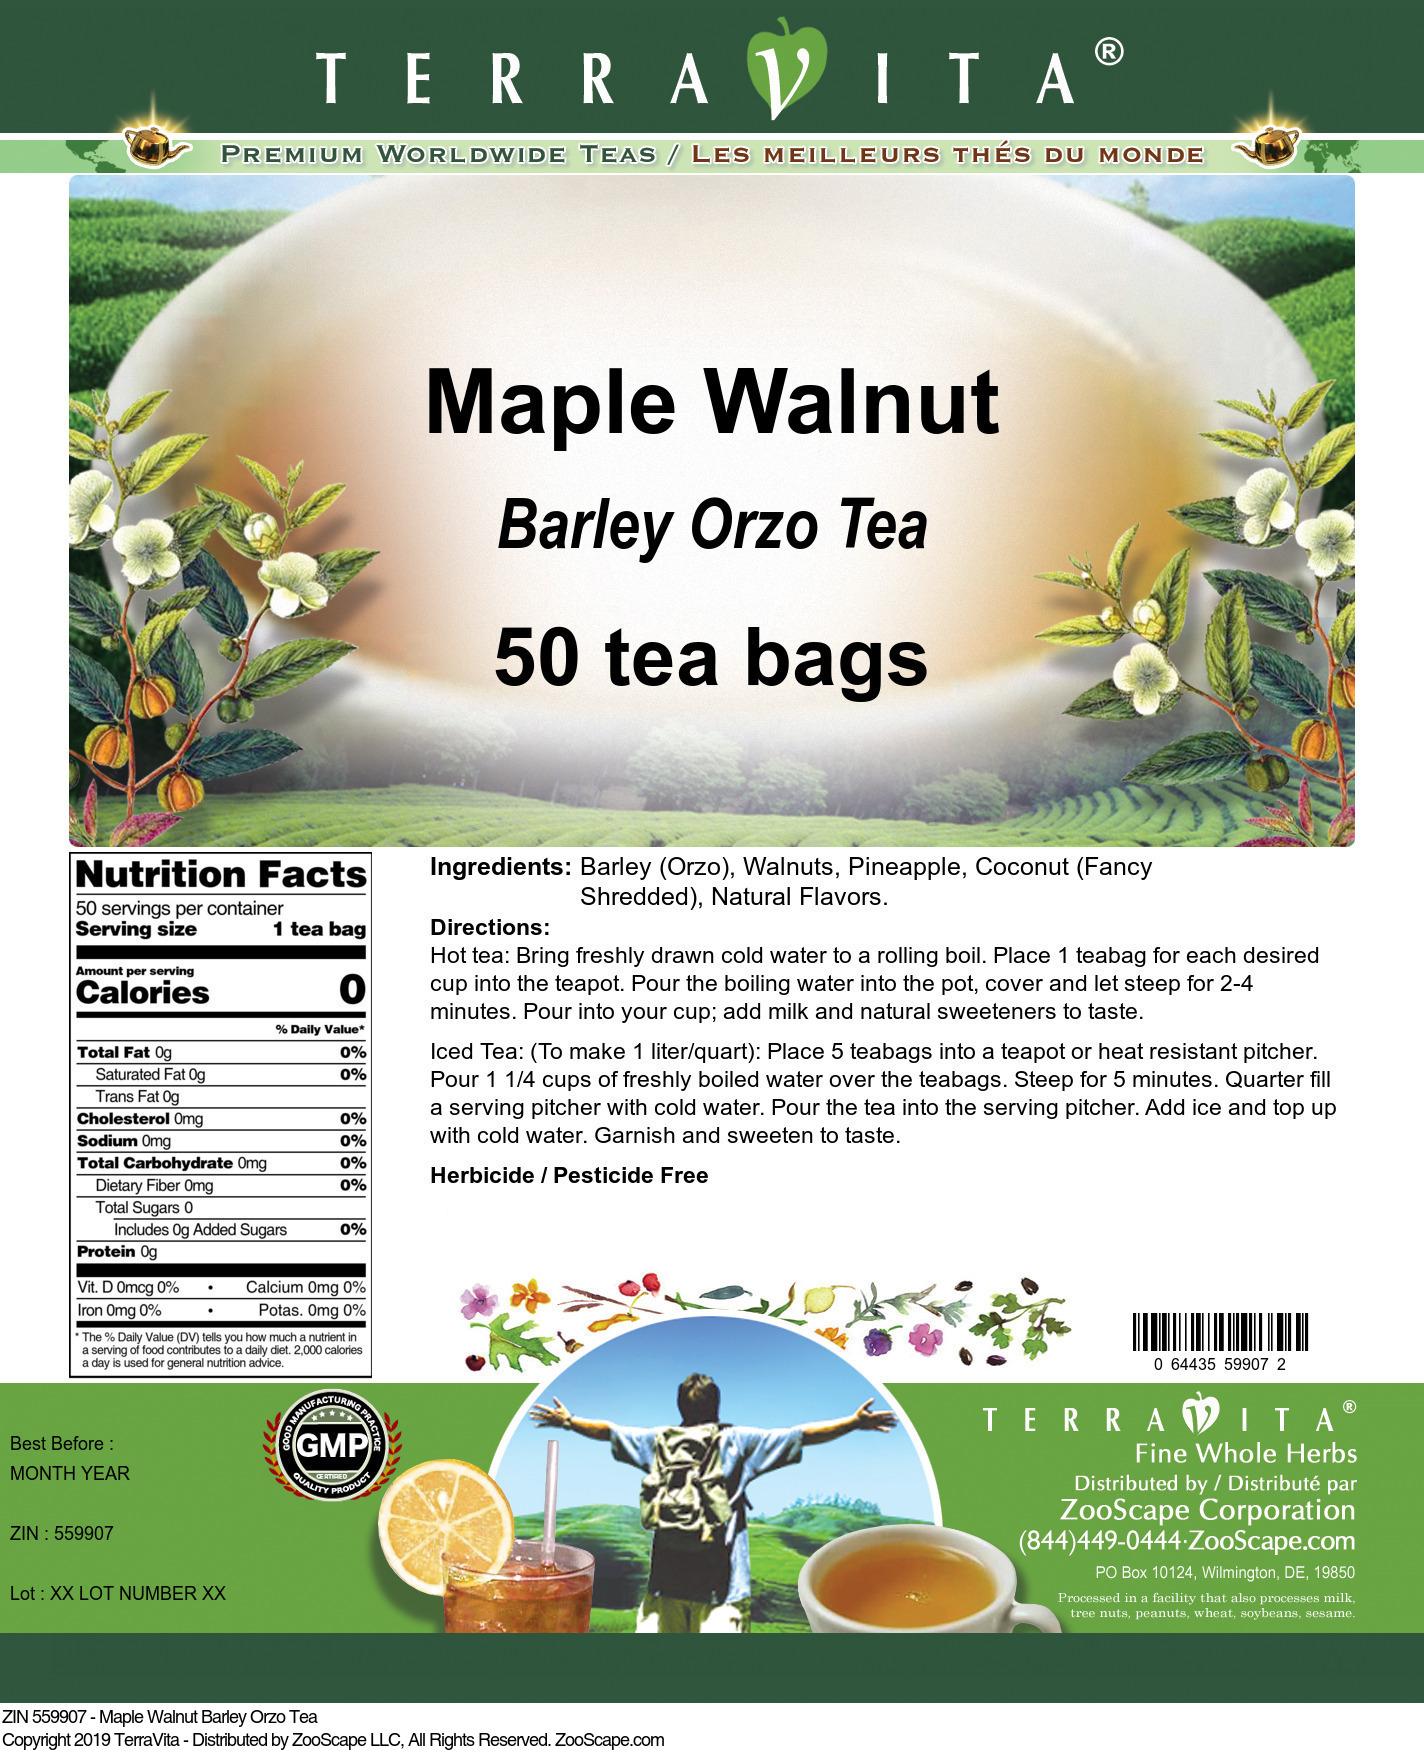 Maple Walnut Barley Orzo